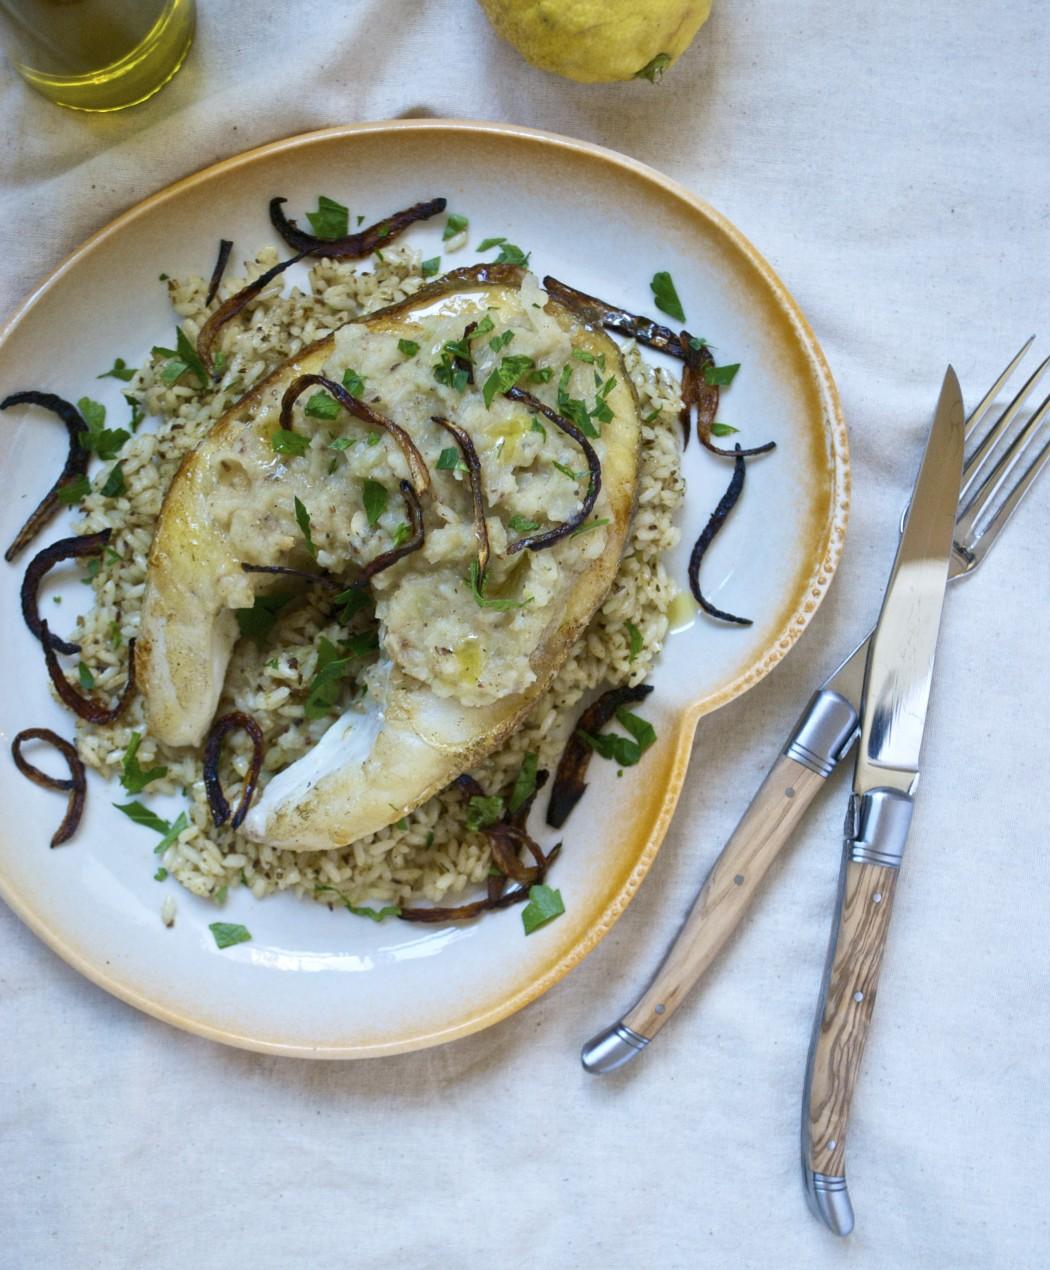 Sayadieh – arabisk torsk med løgpuré